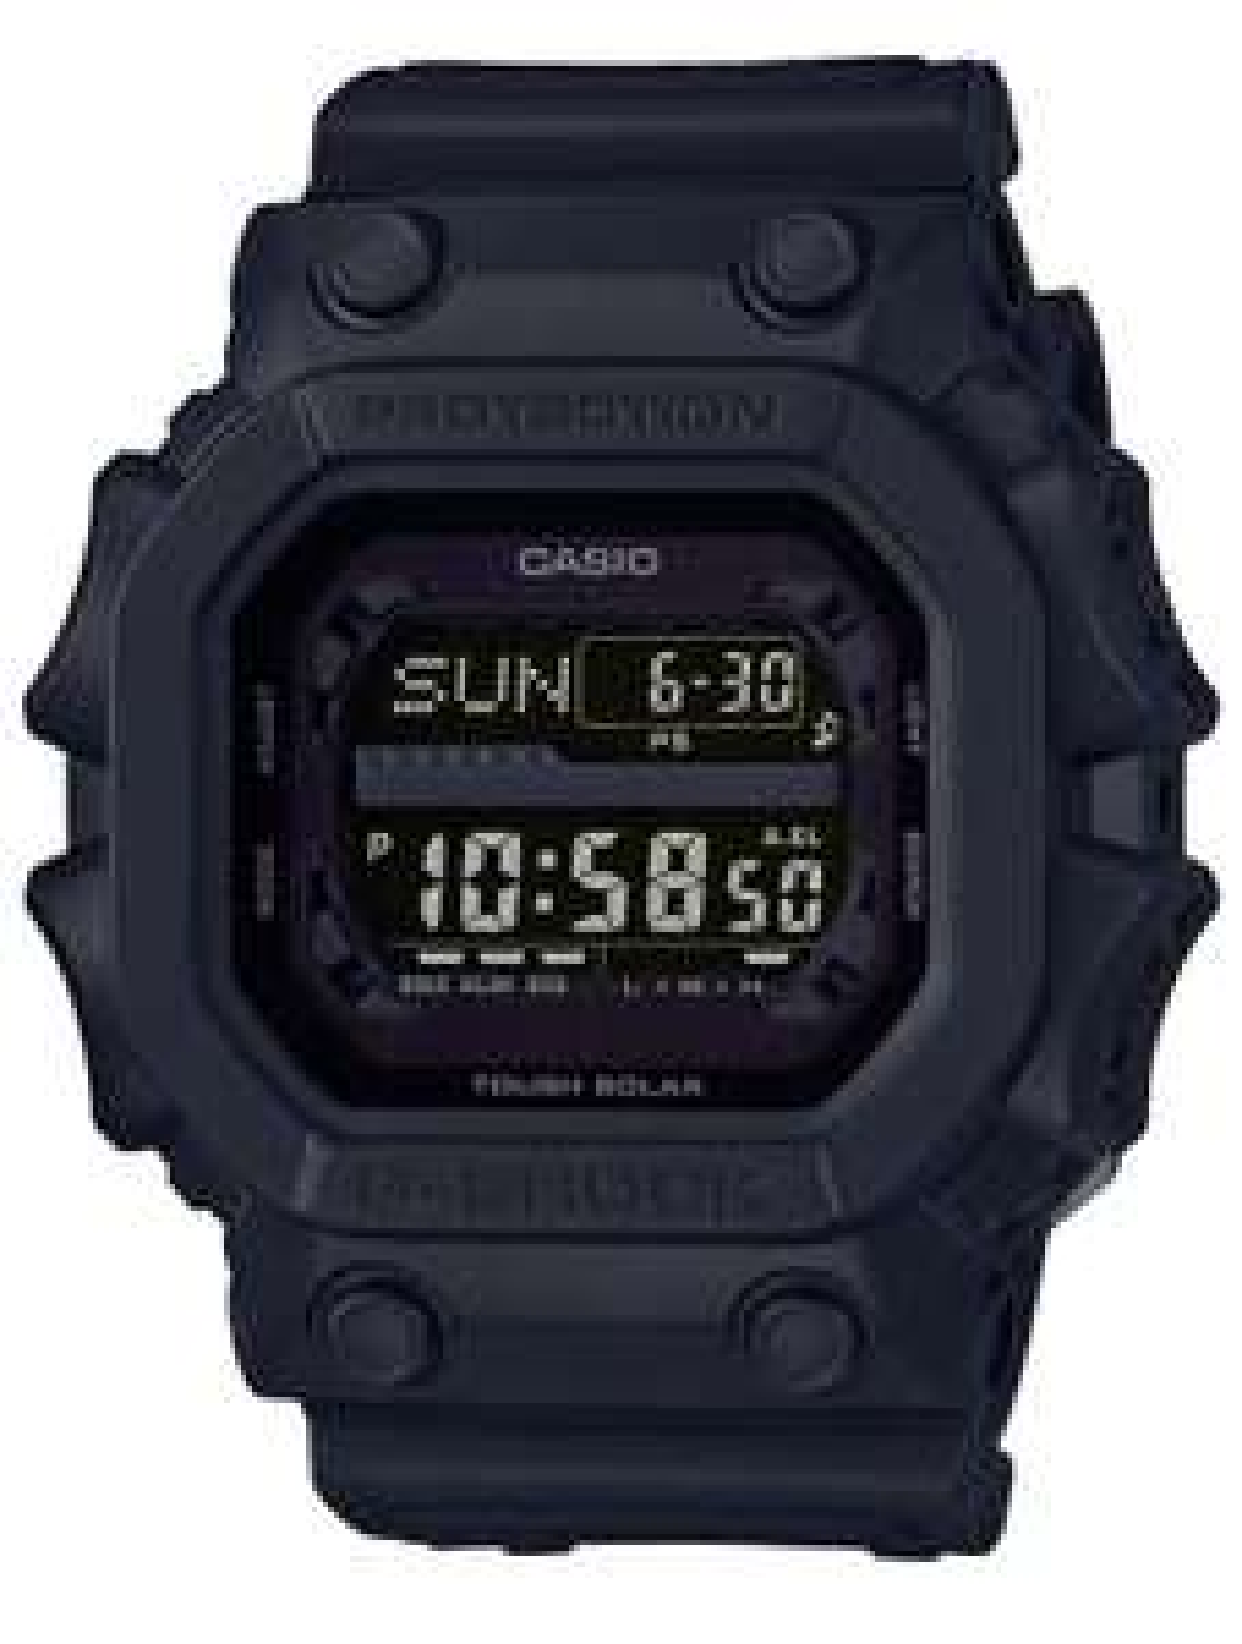 CASIO Mens Digital Quartz Watch with Resin Strap GX-56BB-1ER £78 Amazon